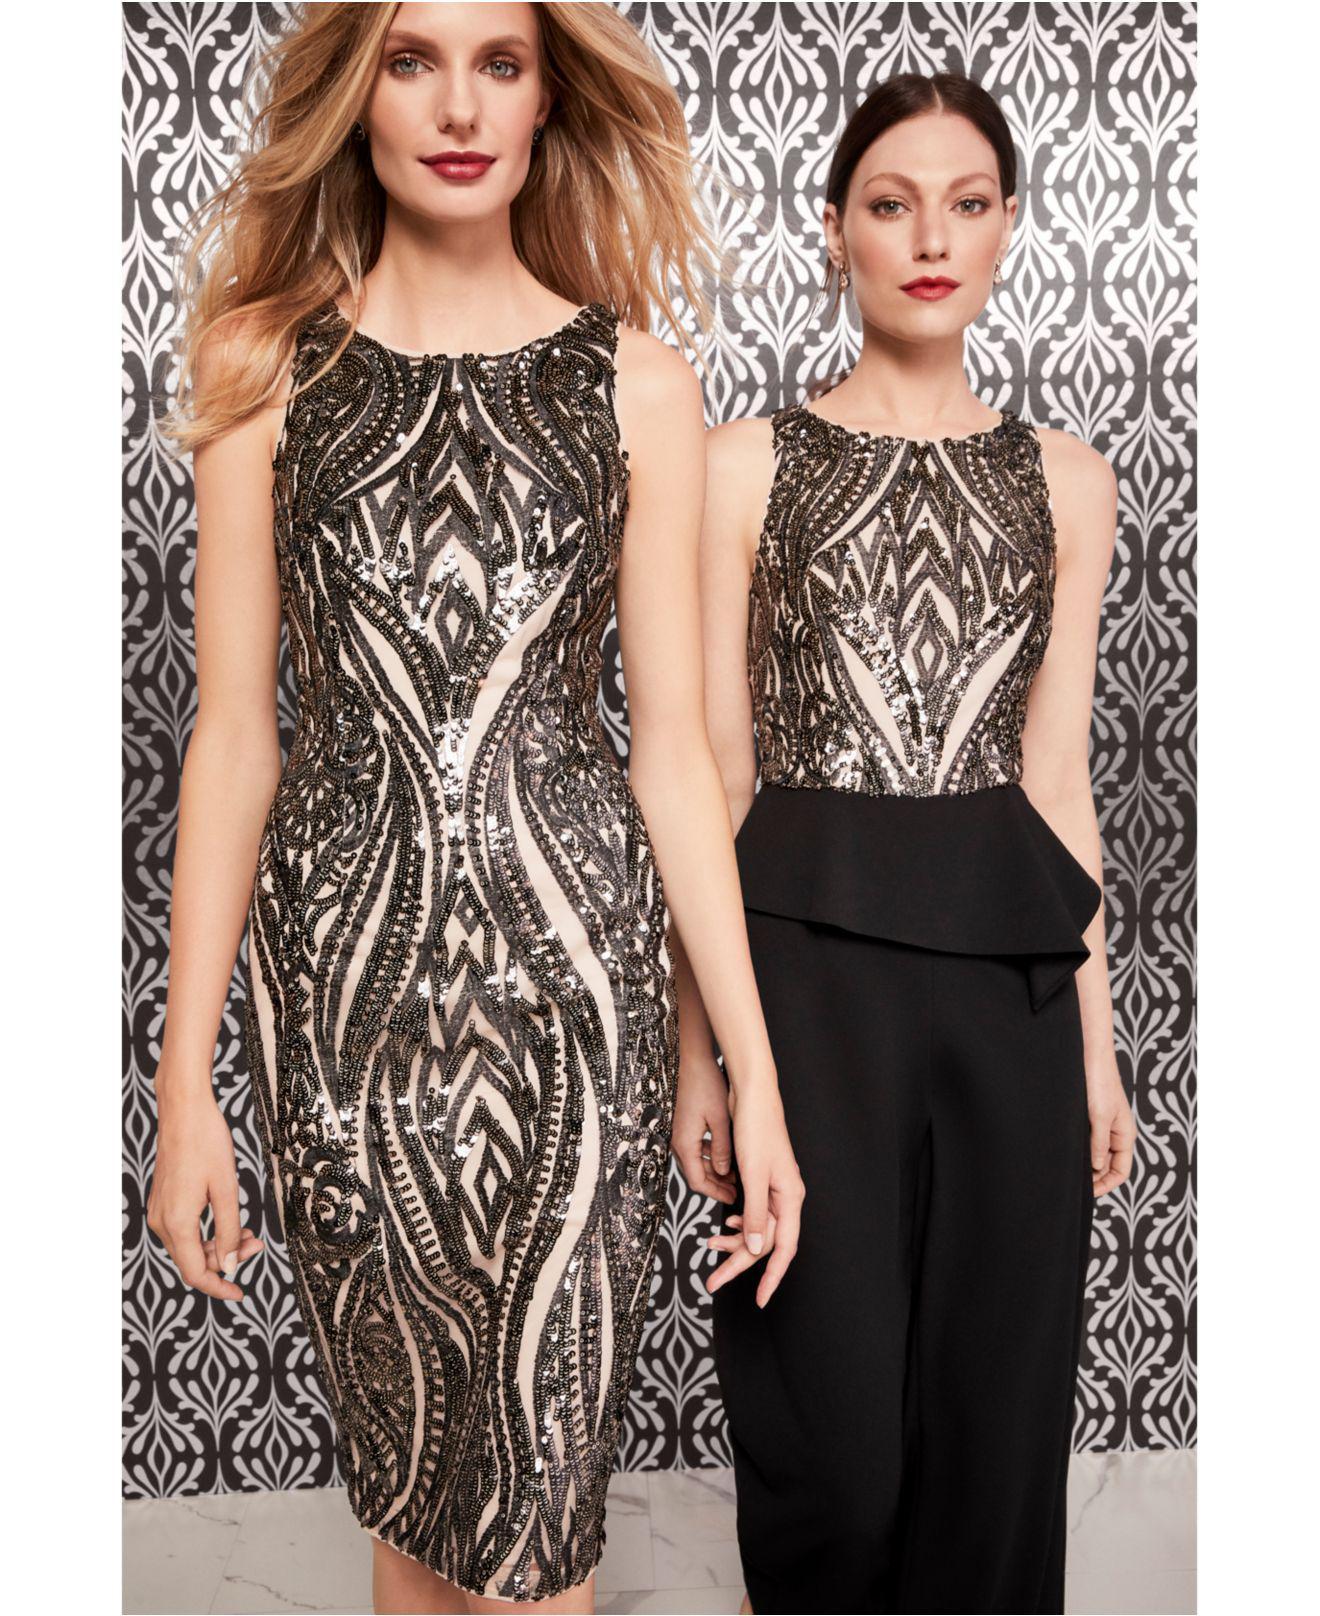 aa87e3c729f6 Adrianna Papell - Black Embellished Peplum Jumpsuit - Lyst. View fullscreen